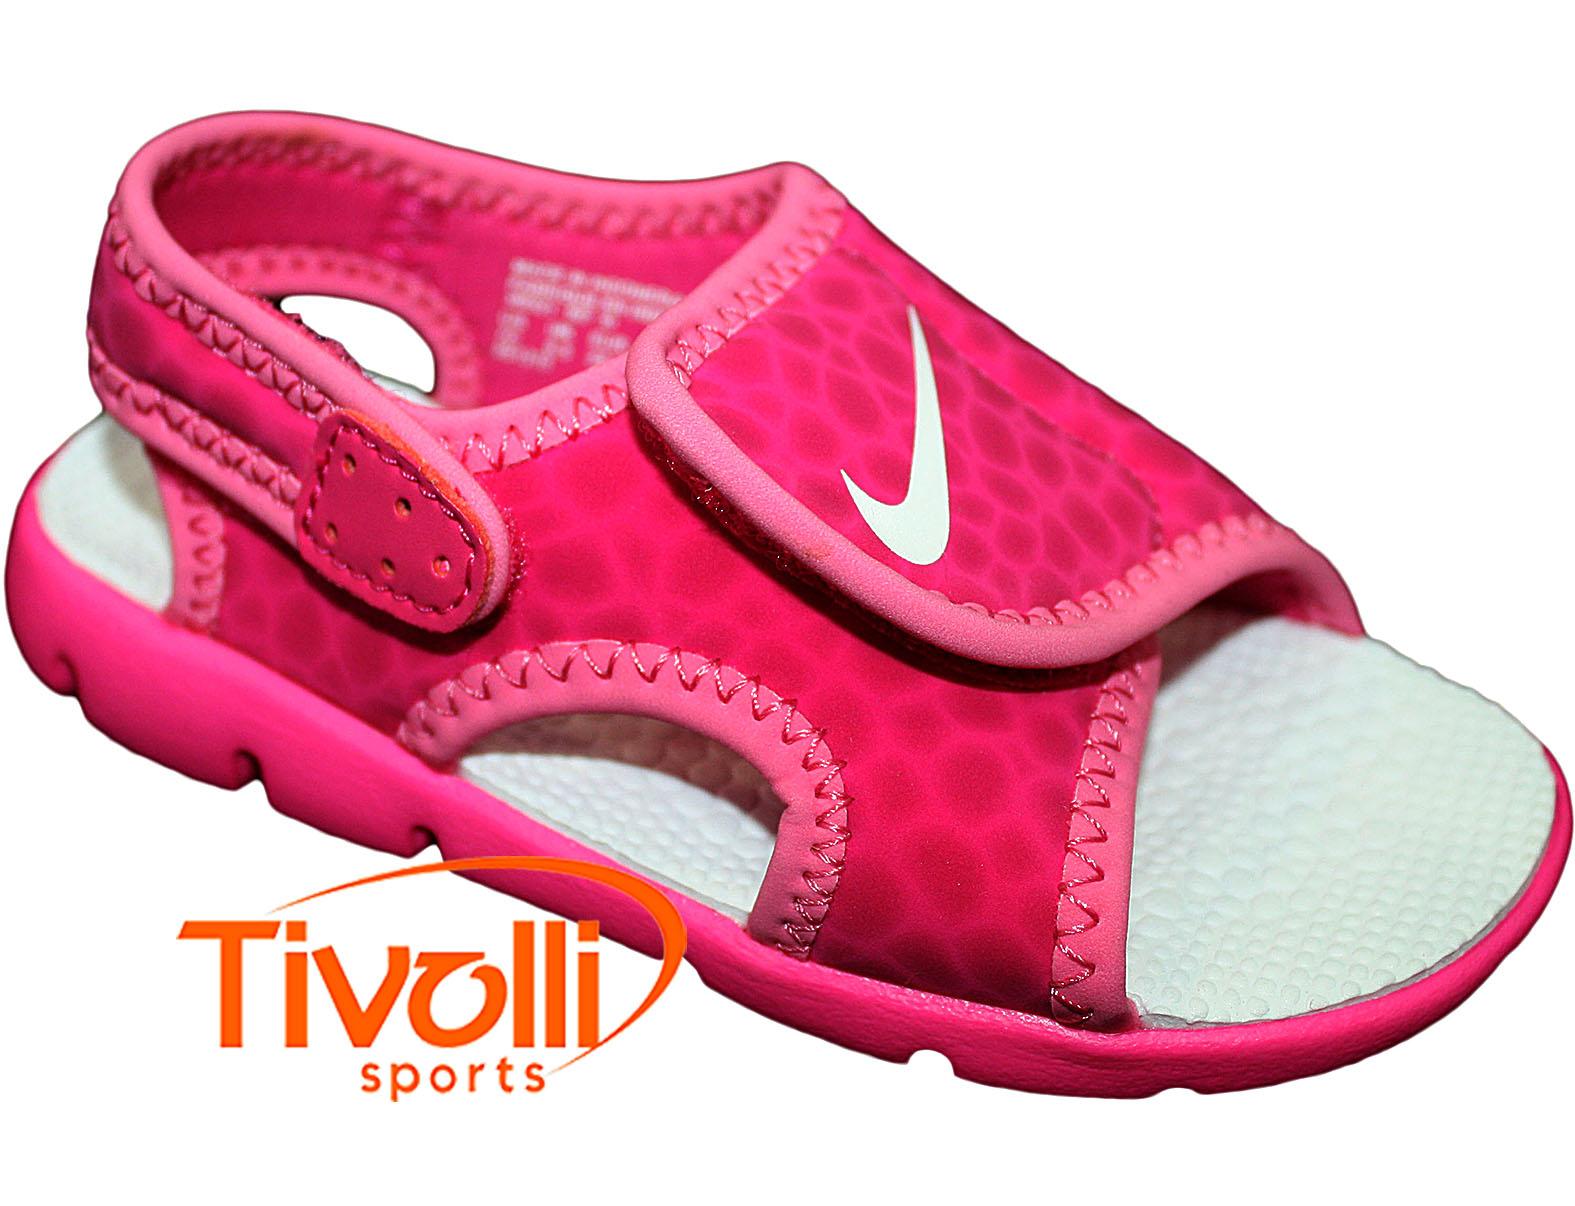 897673ce1 Sandália Nike Sunray Adjust 4 (TD) > 18,5 ao 26 infantil rosa e branco >